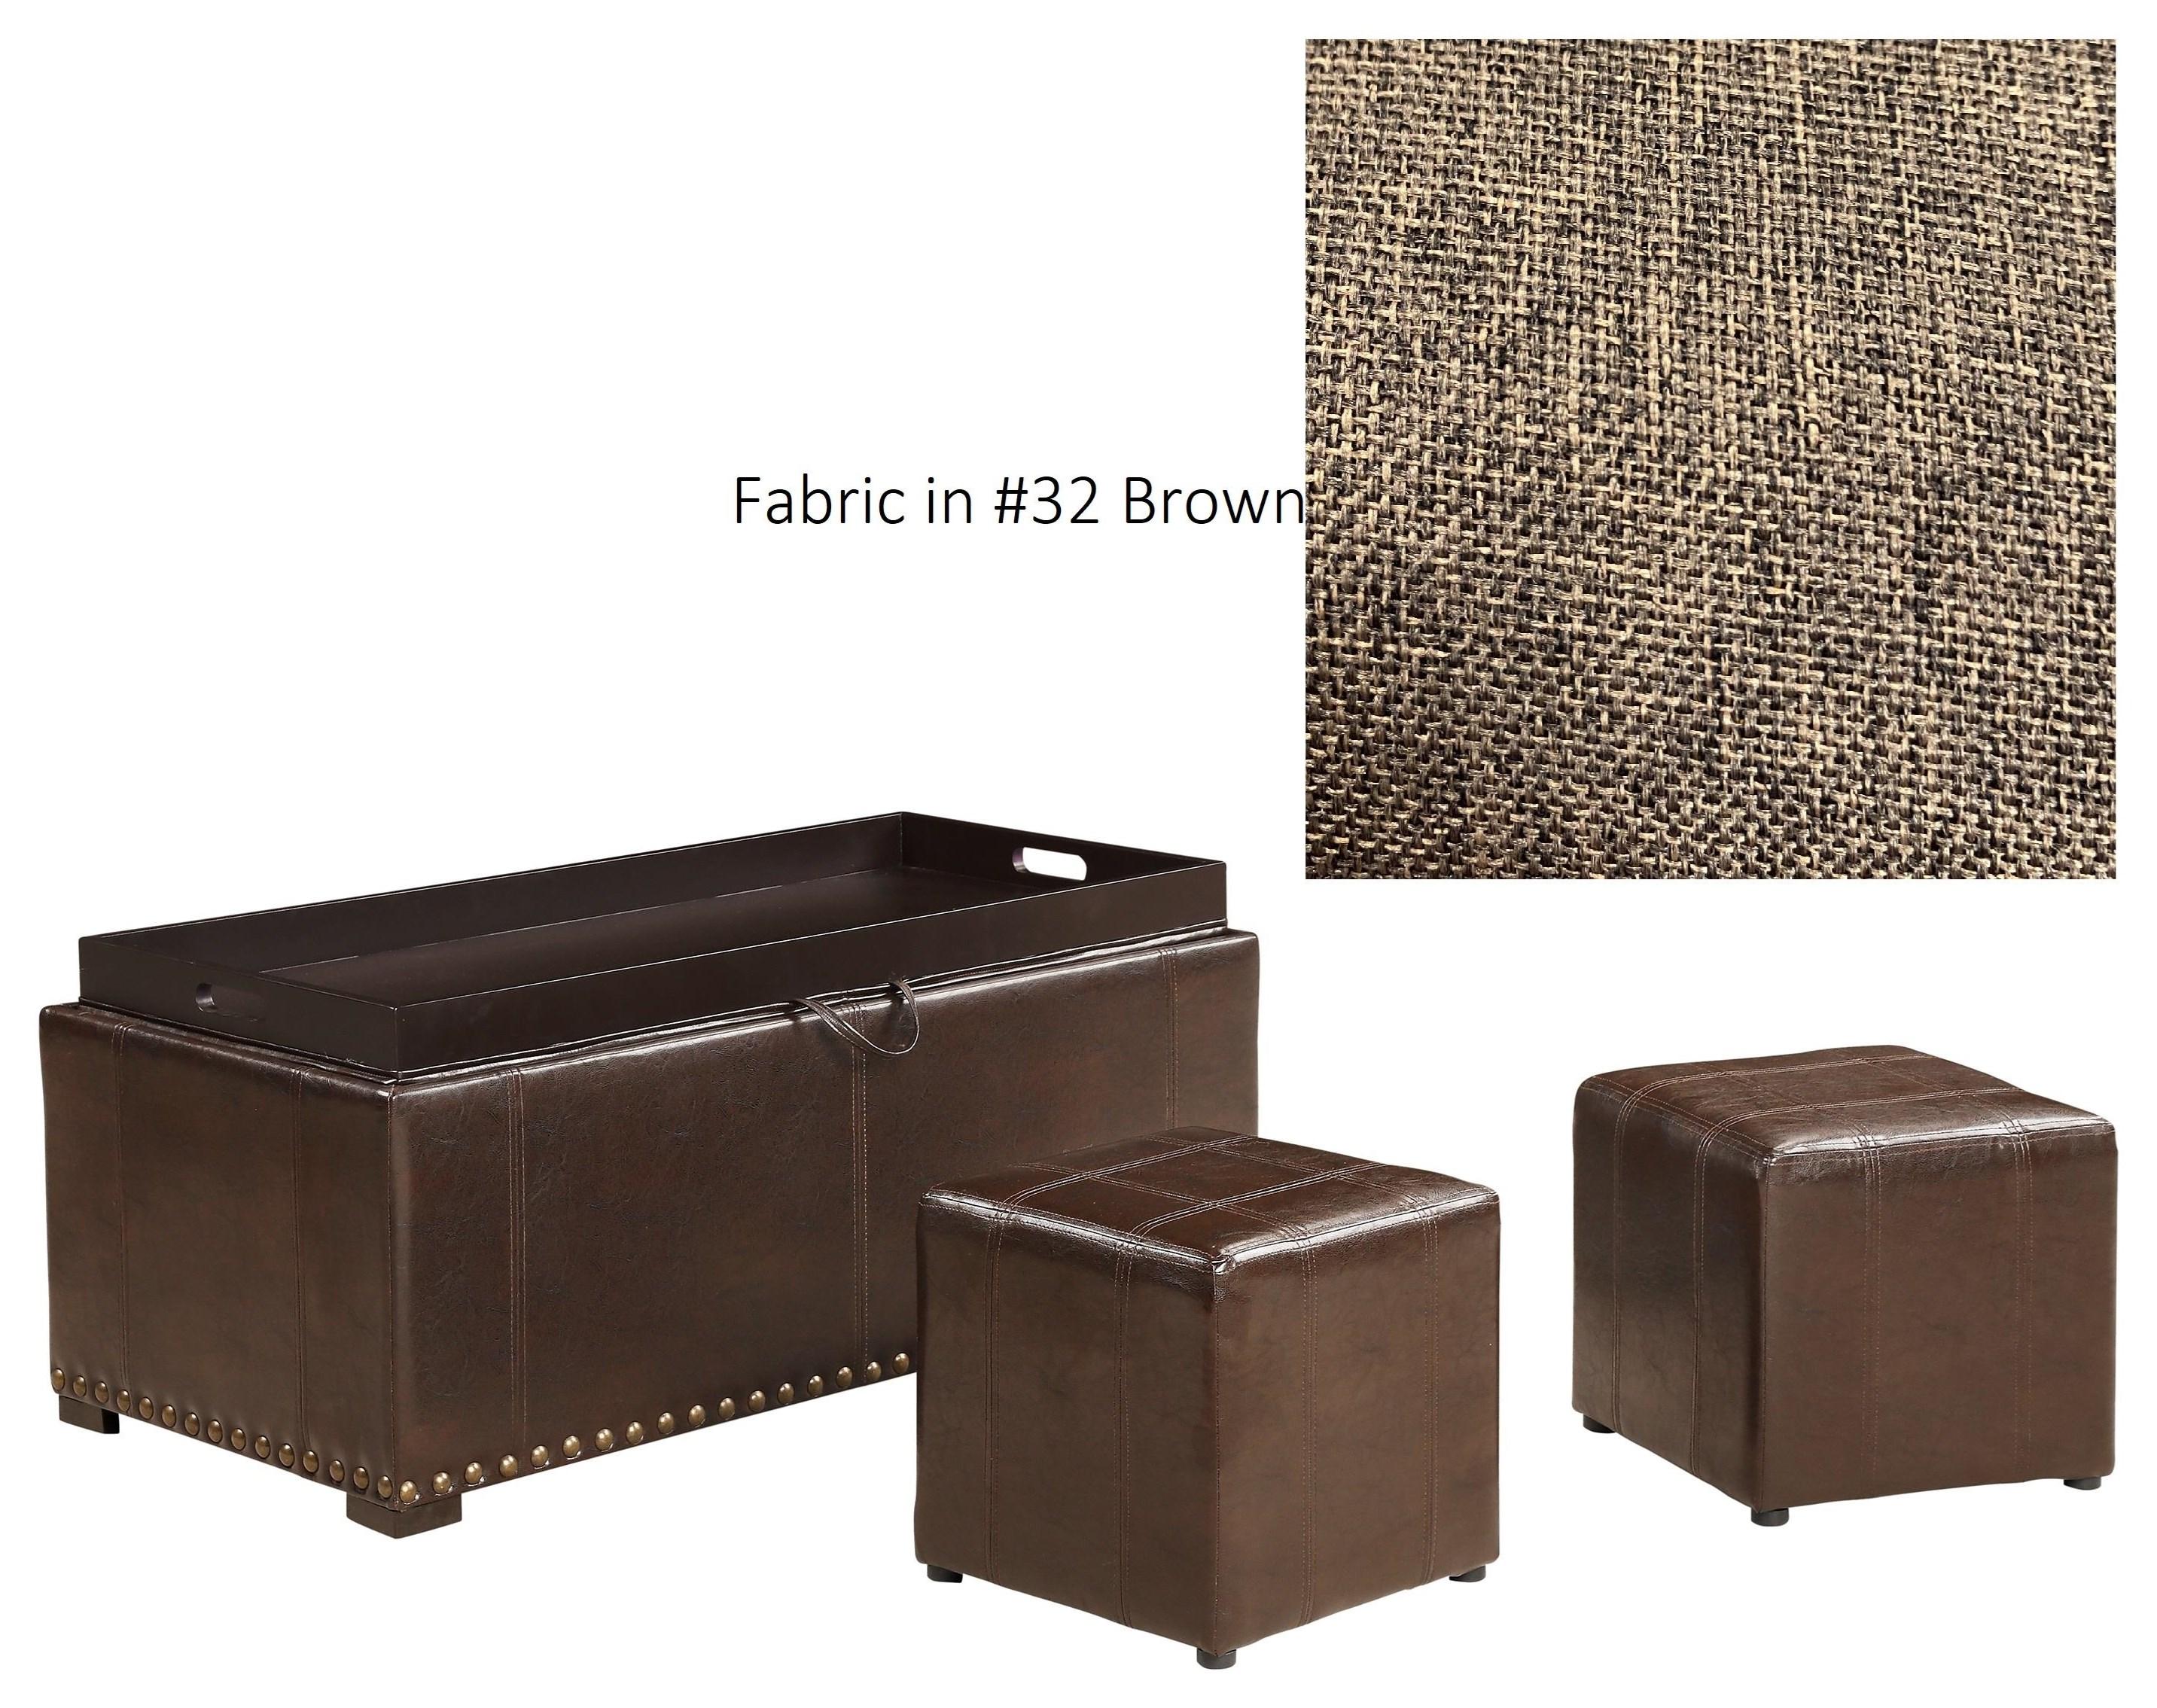 SB008 Ottoman at Bennett's Furniture and Mattresses